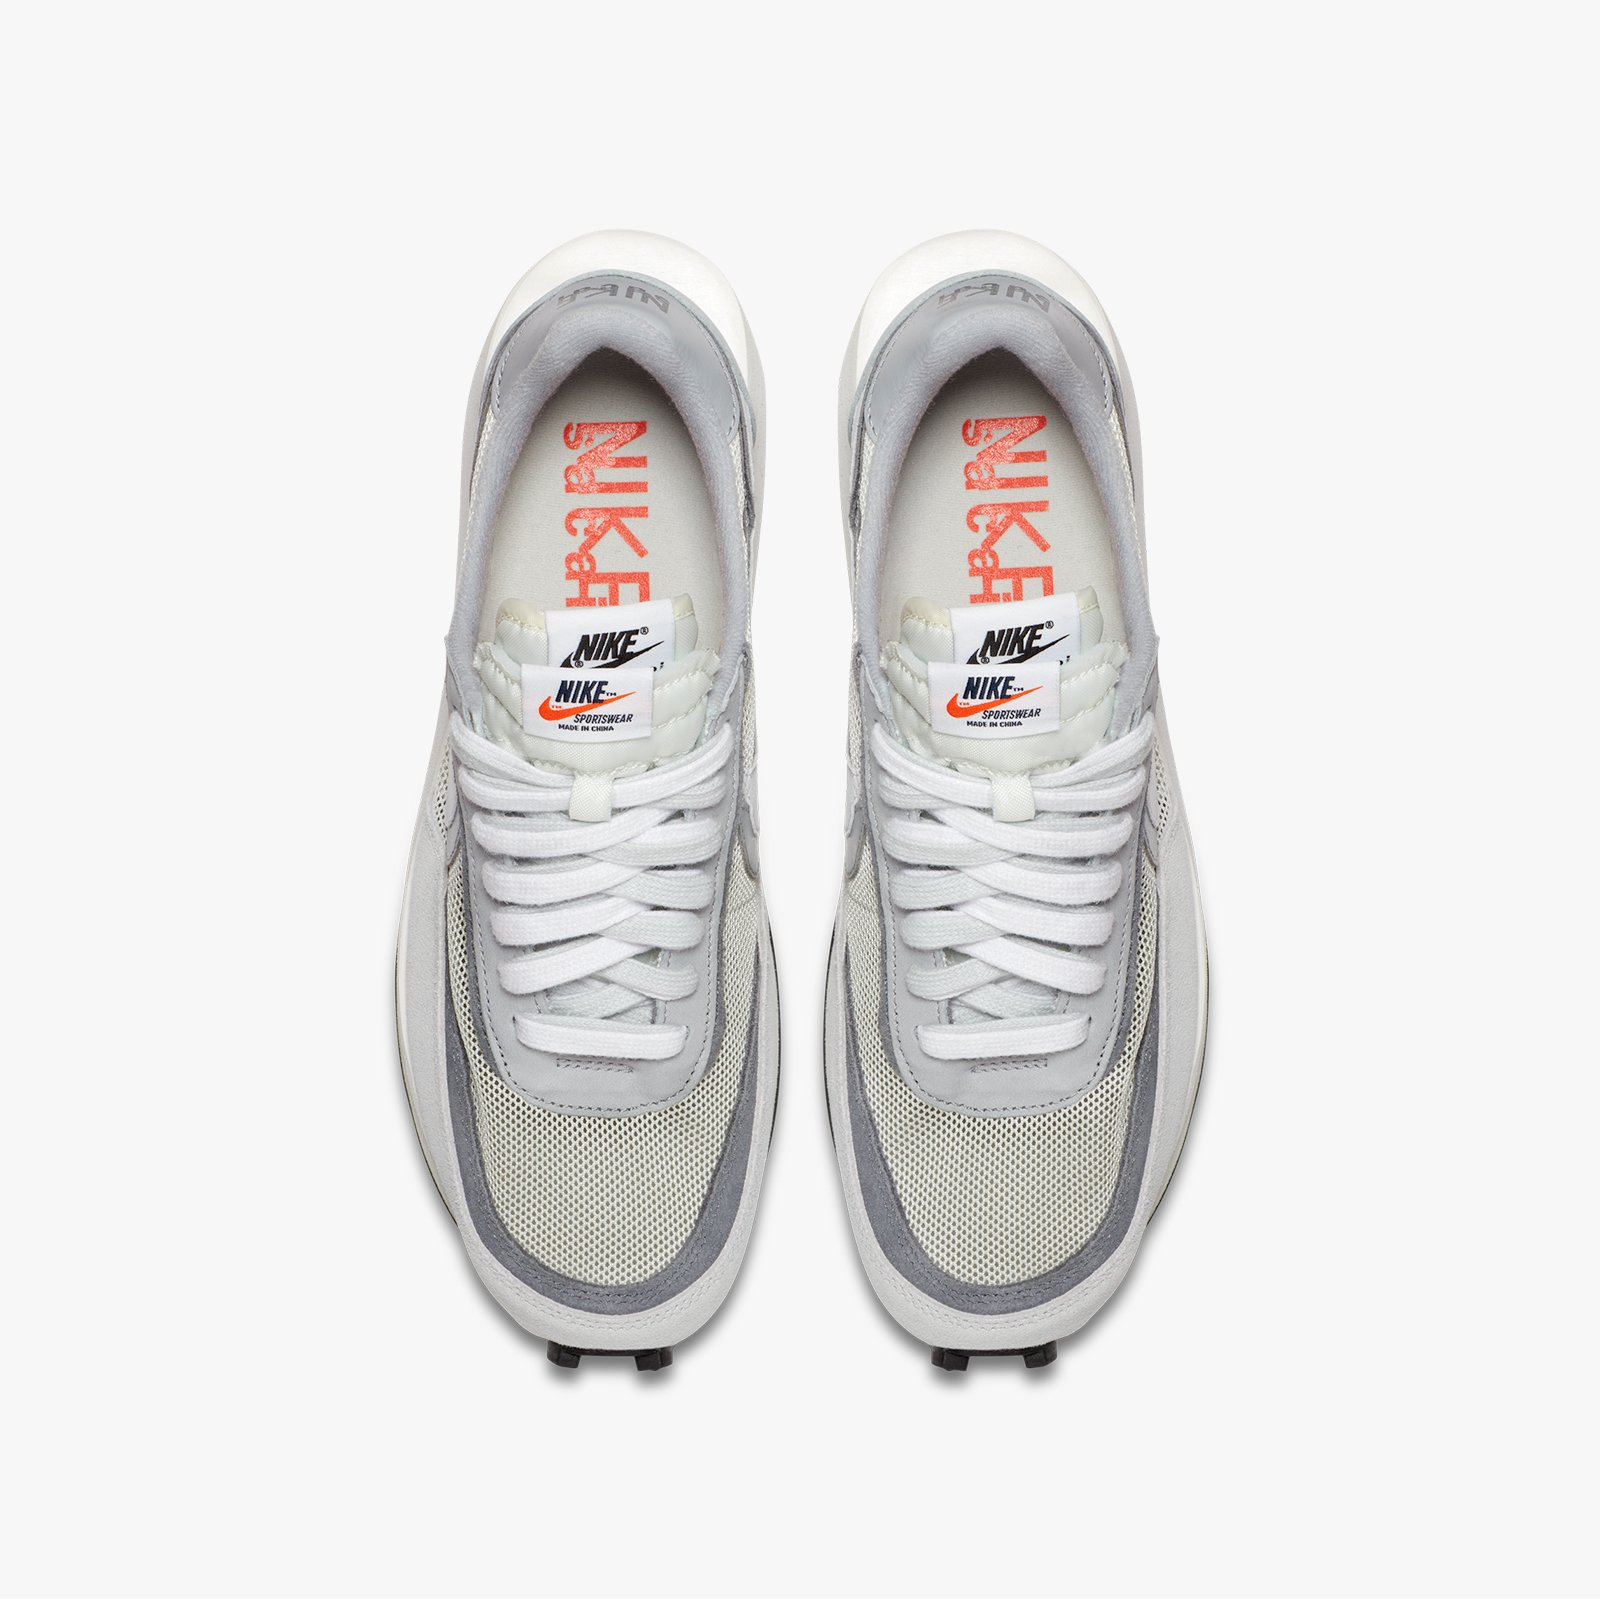 Nike LDWaffle / SACAI - Bv0073-100